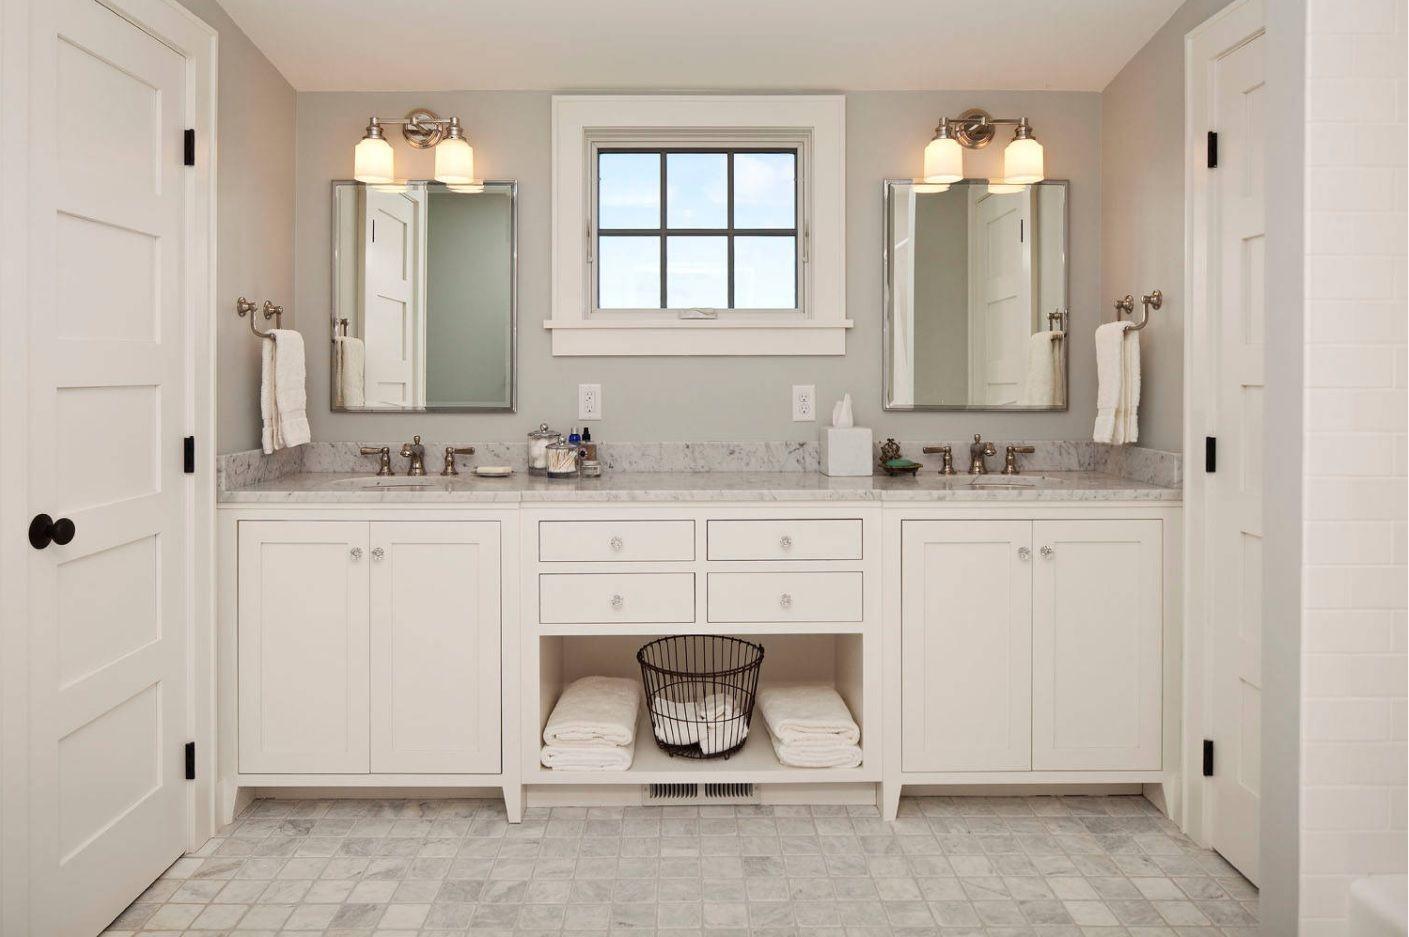 Jack and Jill Bathroom Interior Design Ideas. Creamy white color